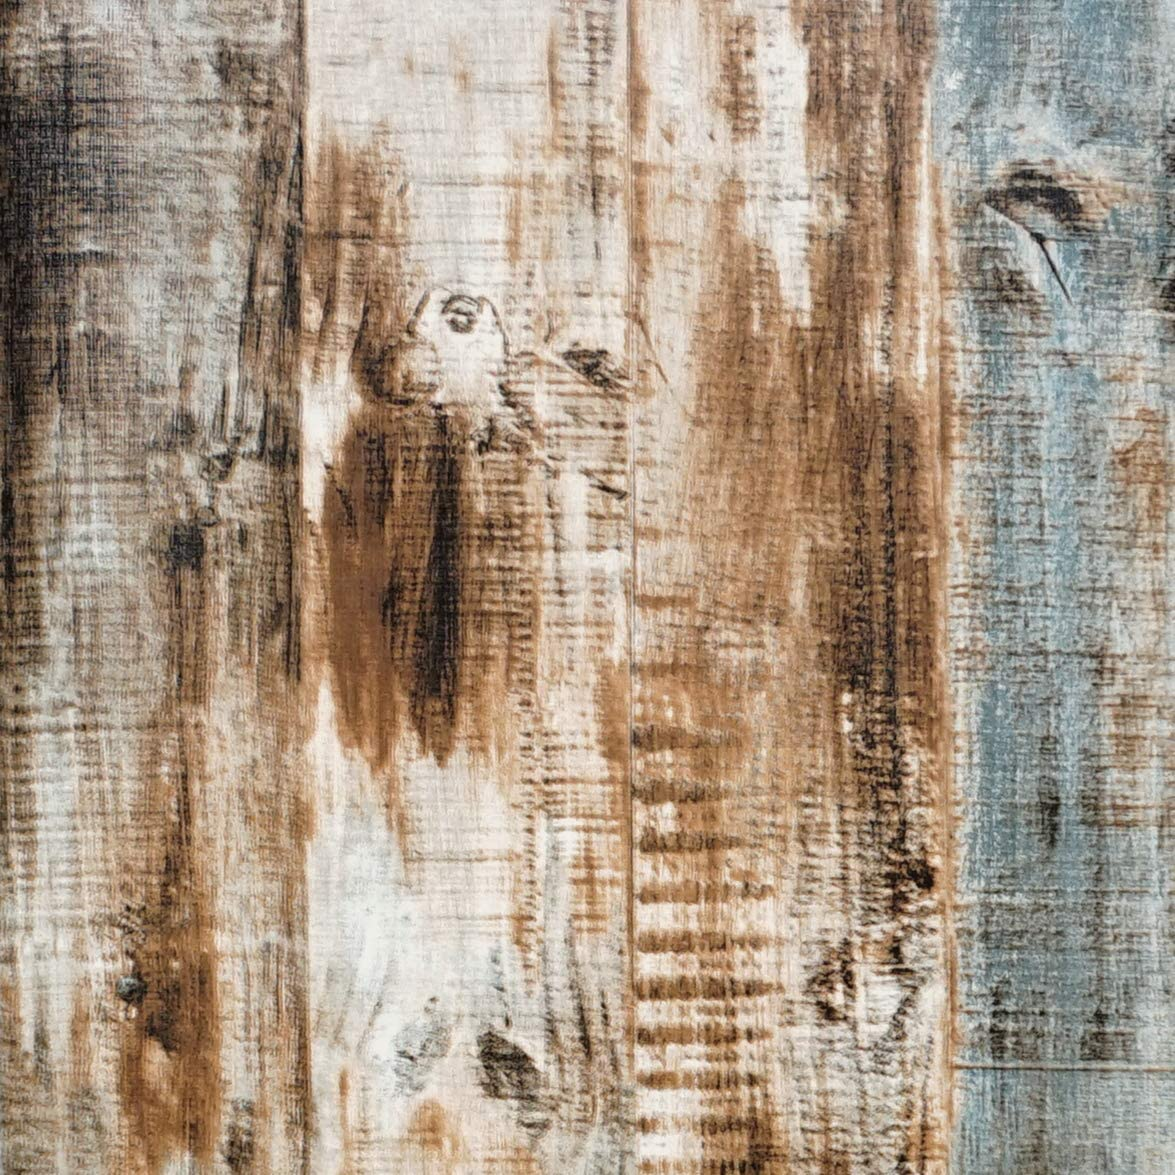 Vintage Wood Wallpaper Self Adhesive Wood Peel And Stick Wallpaper Wood Plank Wallpaper Rustic Wood Wallpaper Reclaimed Wood Wallpaper Decorative Faux Wallpaper Roll 17 7 X78 7 Amazon Com